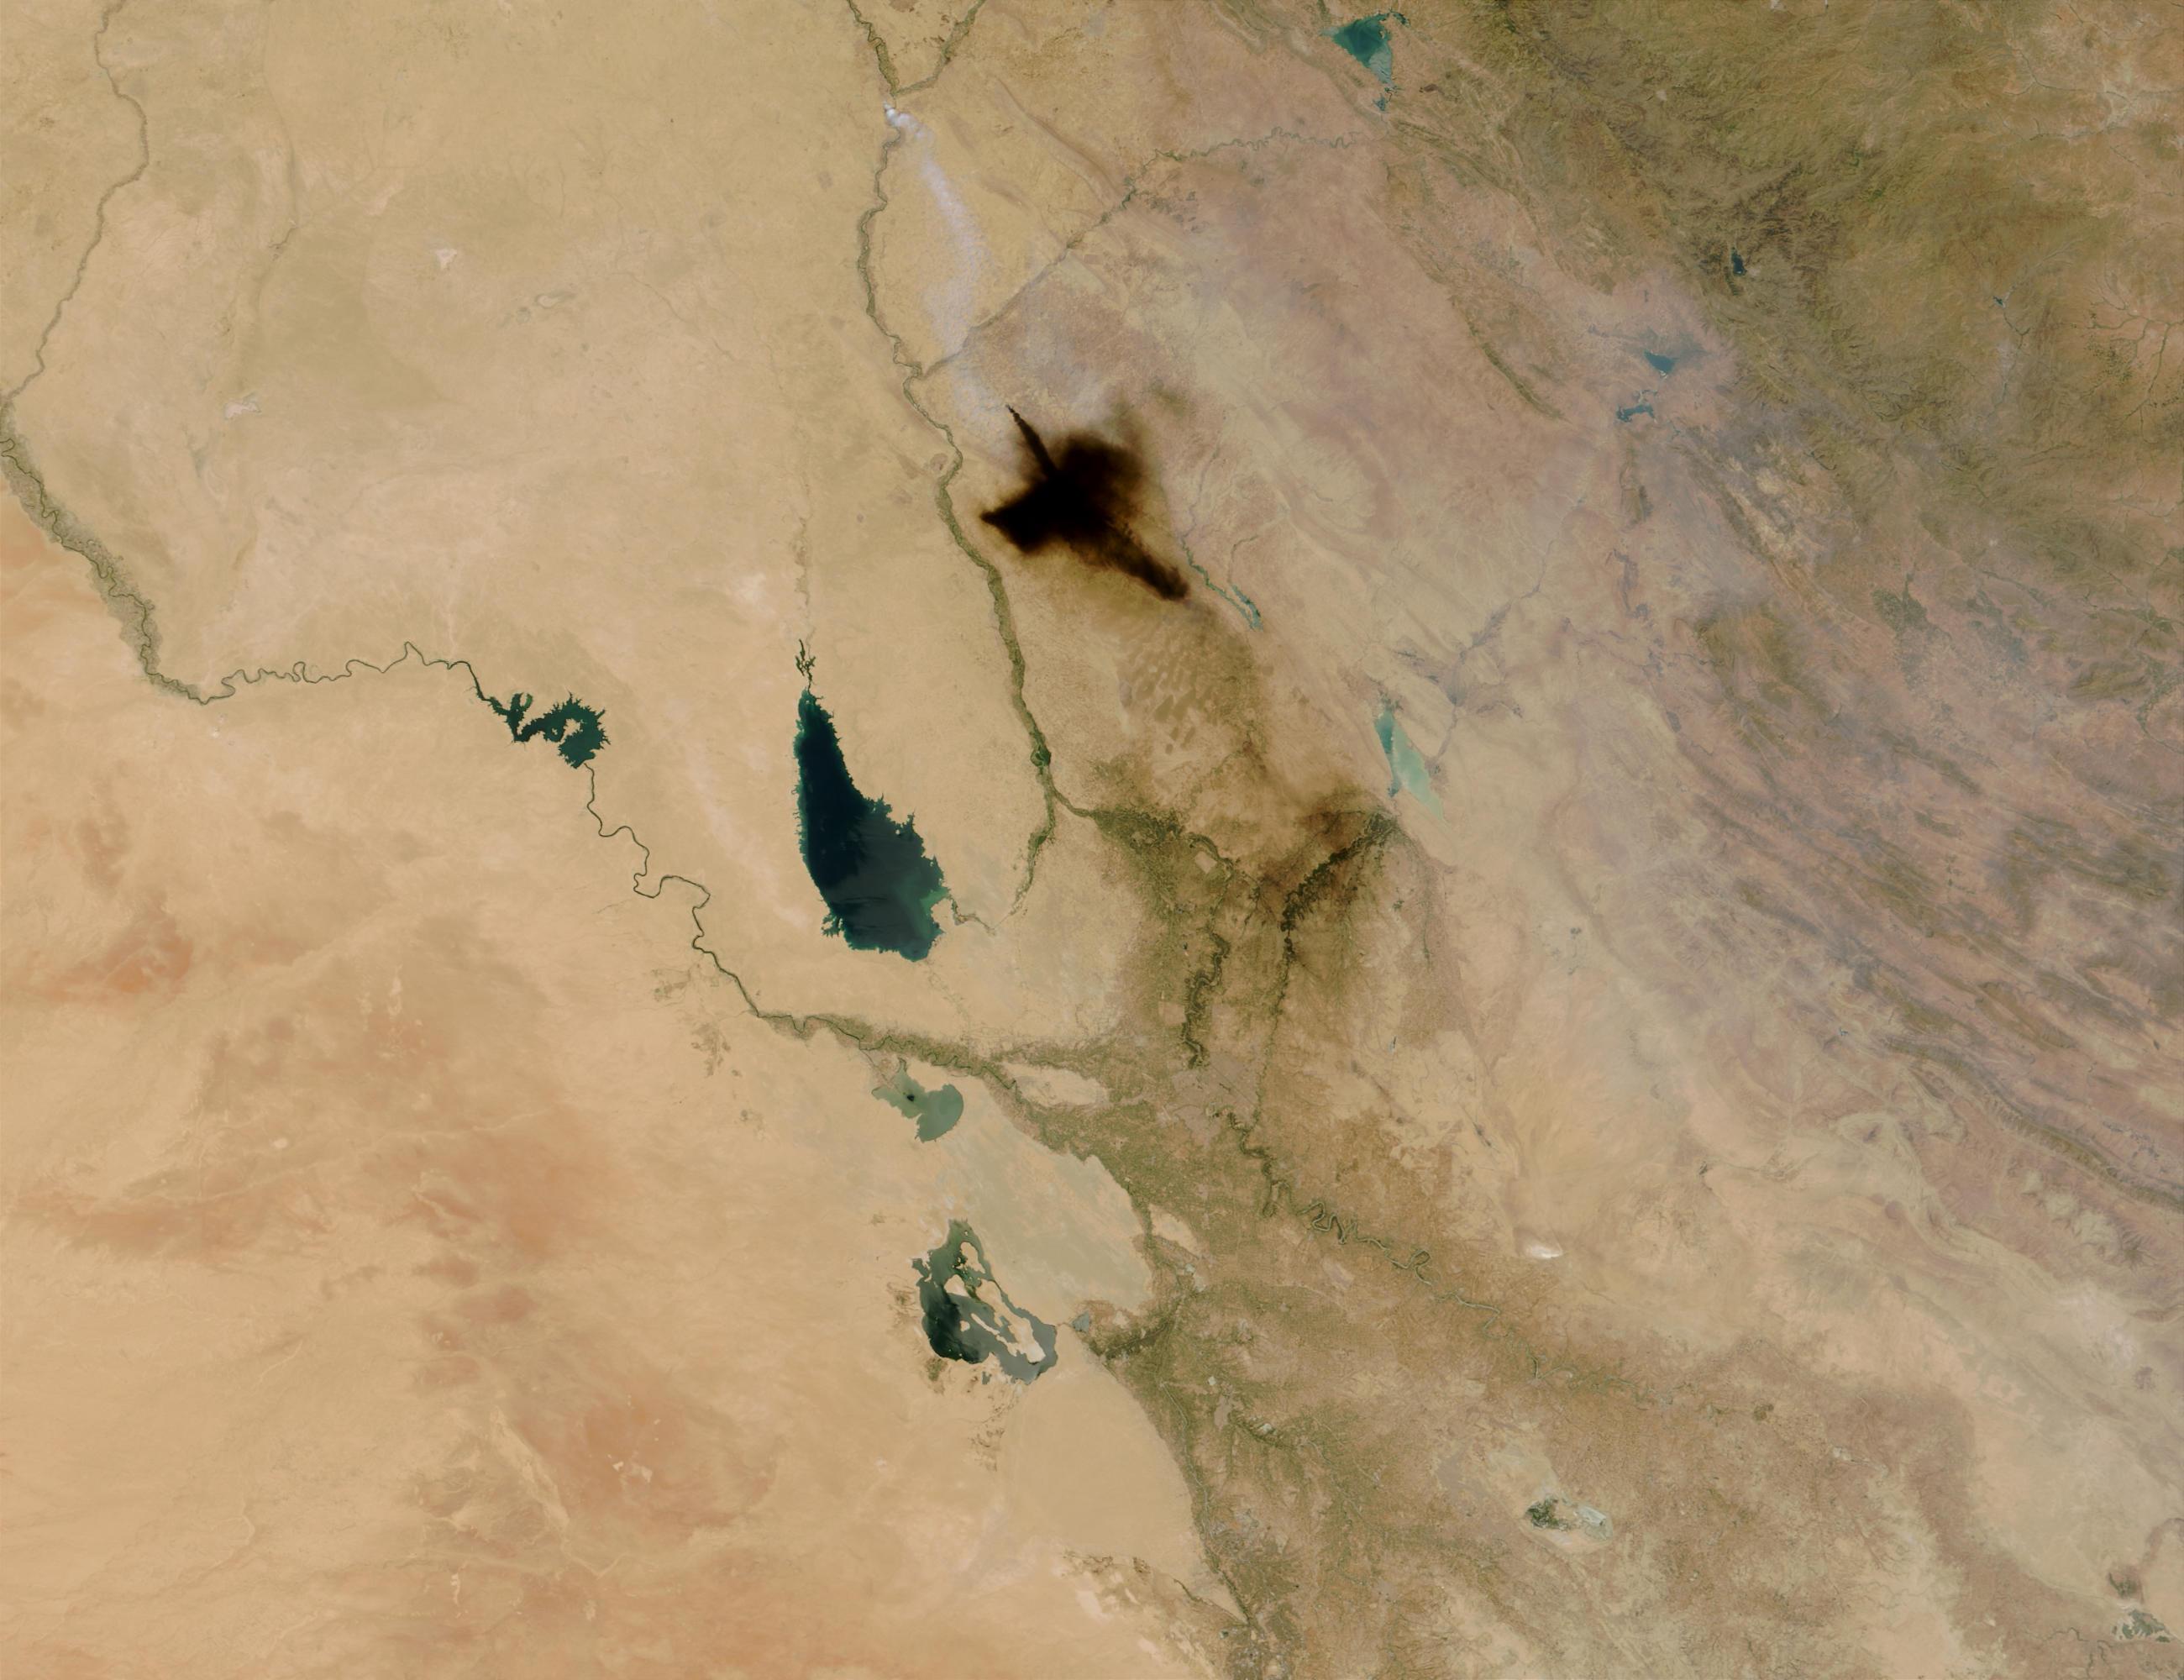 Smoke plume from oil fire near Baghdad, Iraq